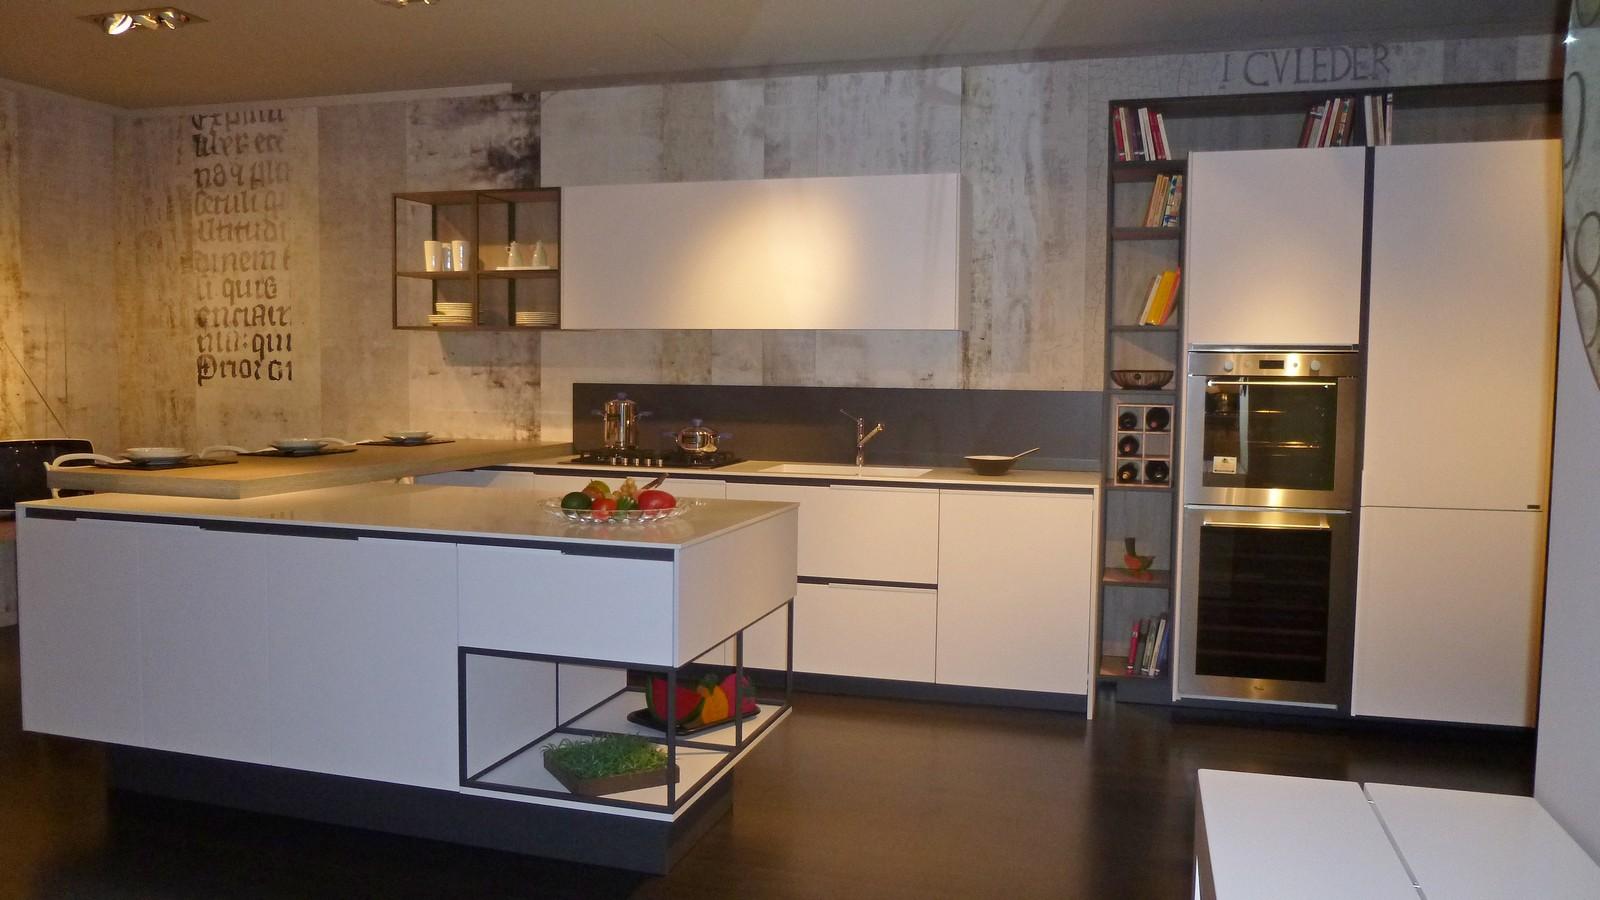 Cucina Usata Lombardia | Attraente Rivenditori Arrital Cucine ...